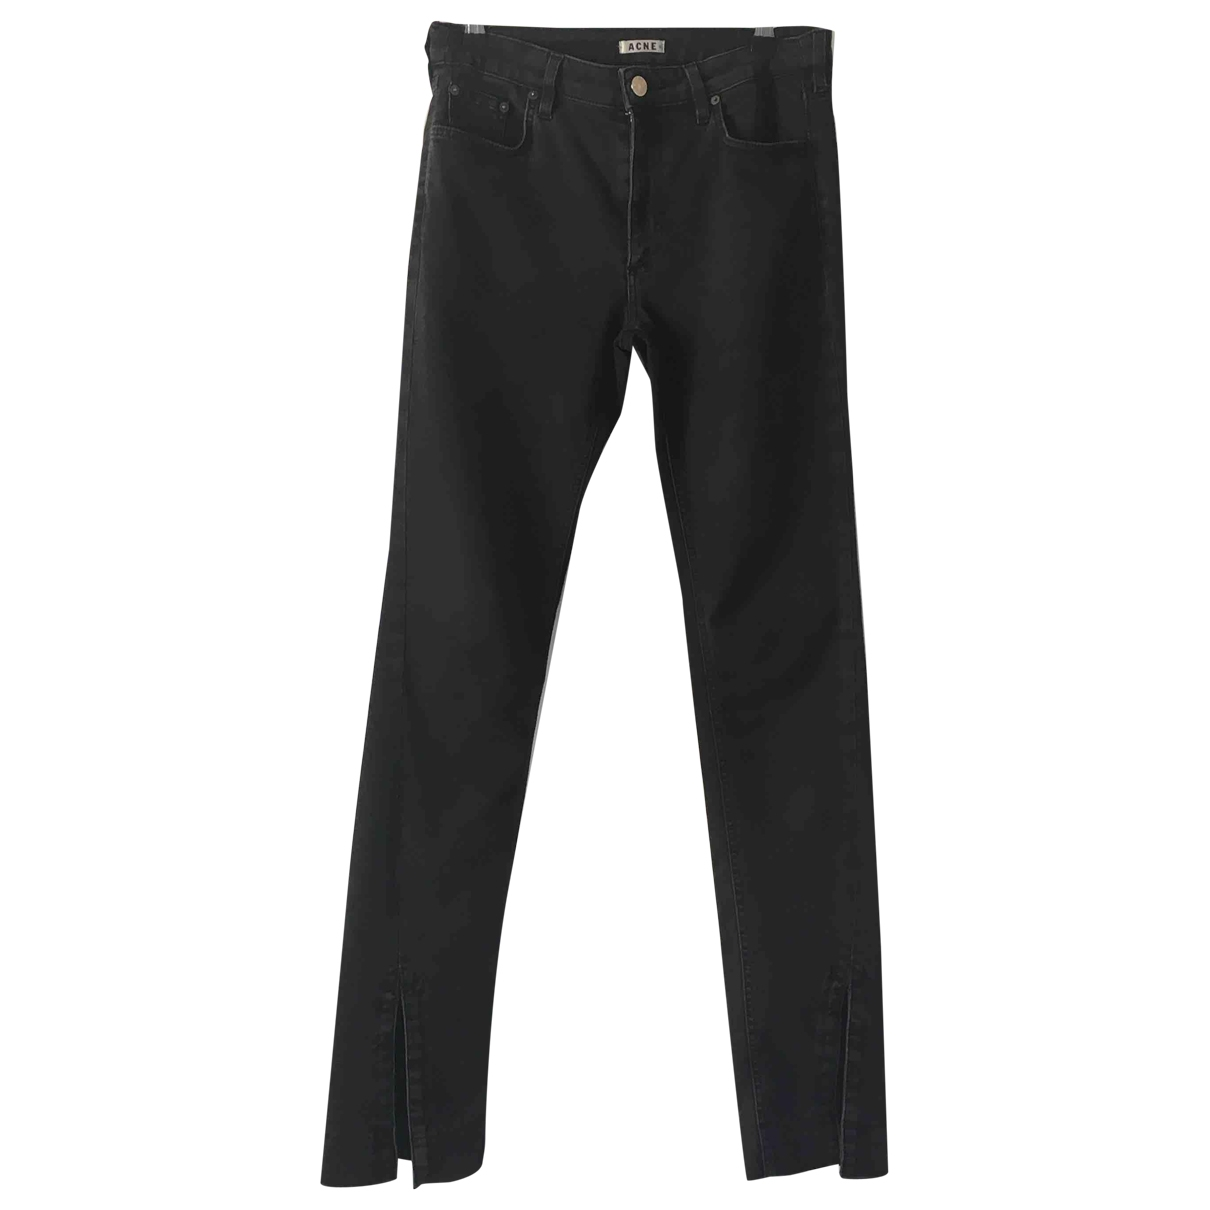 Acne Studios \N Black Cotton Trousers for Women 38 IT